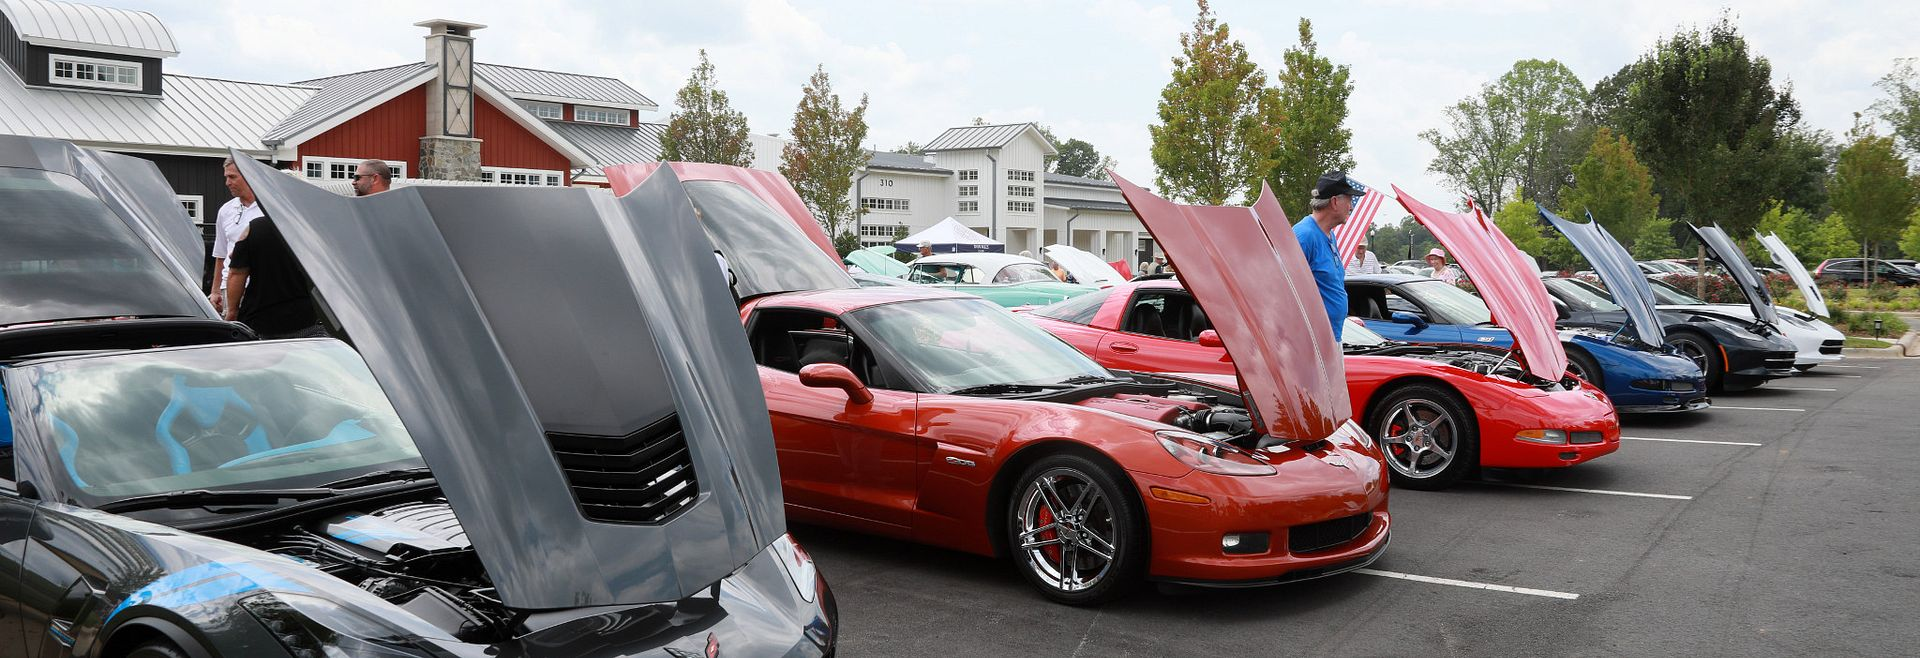 A line of Corvette cars shown at a car show